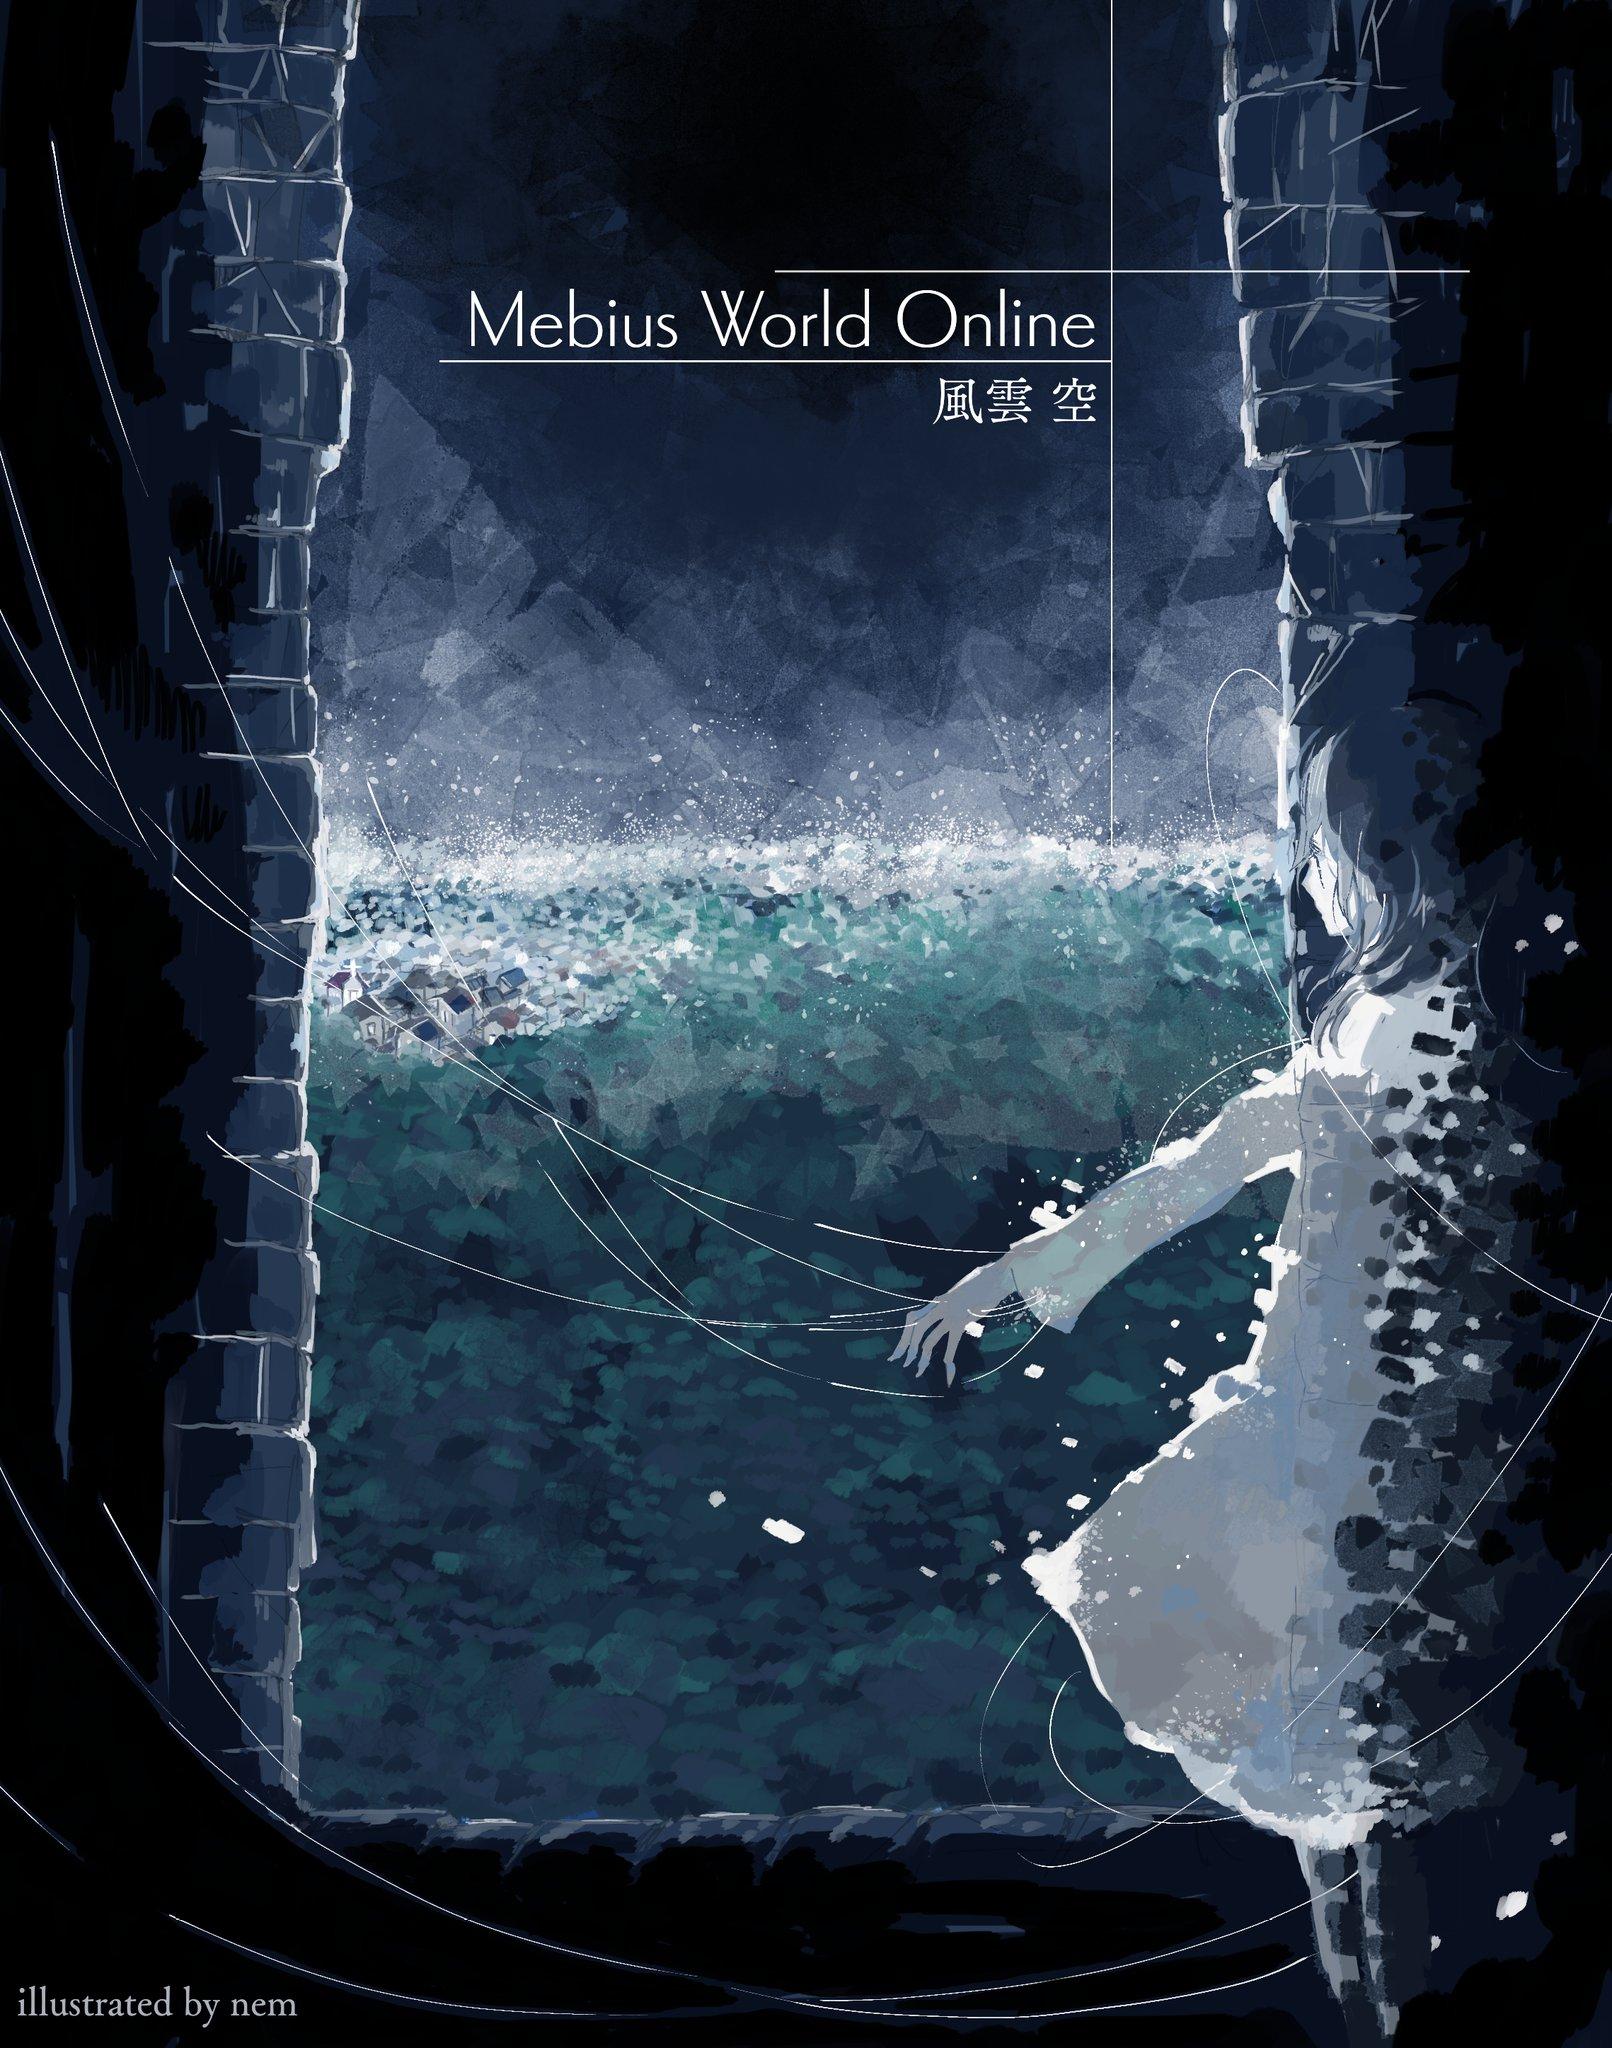 Mebius World Online 〜ゲーム初心者の真里姉と行くVRMMOのんびり? 体験記〜の表紙